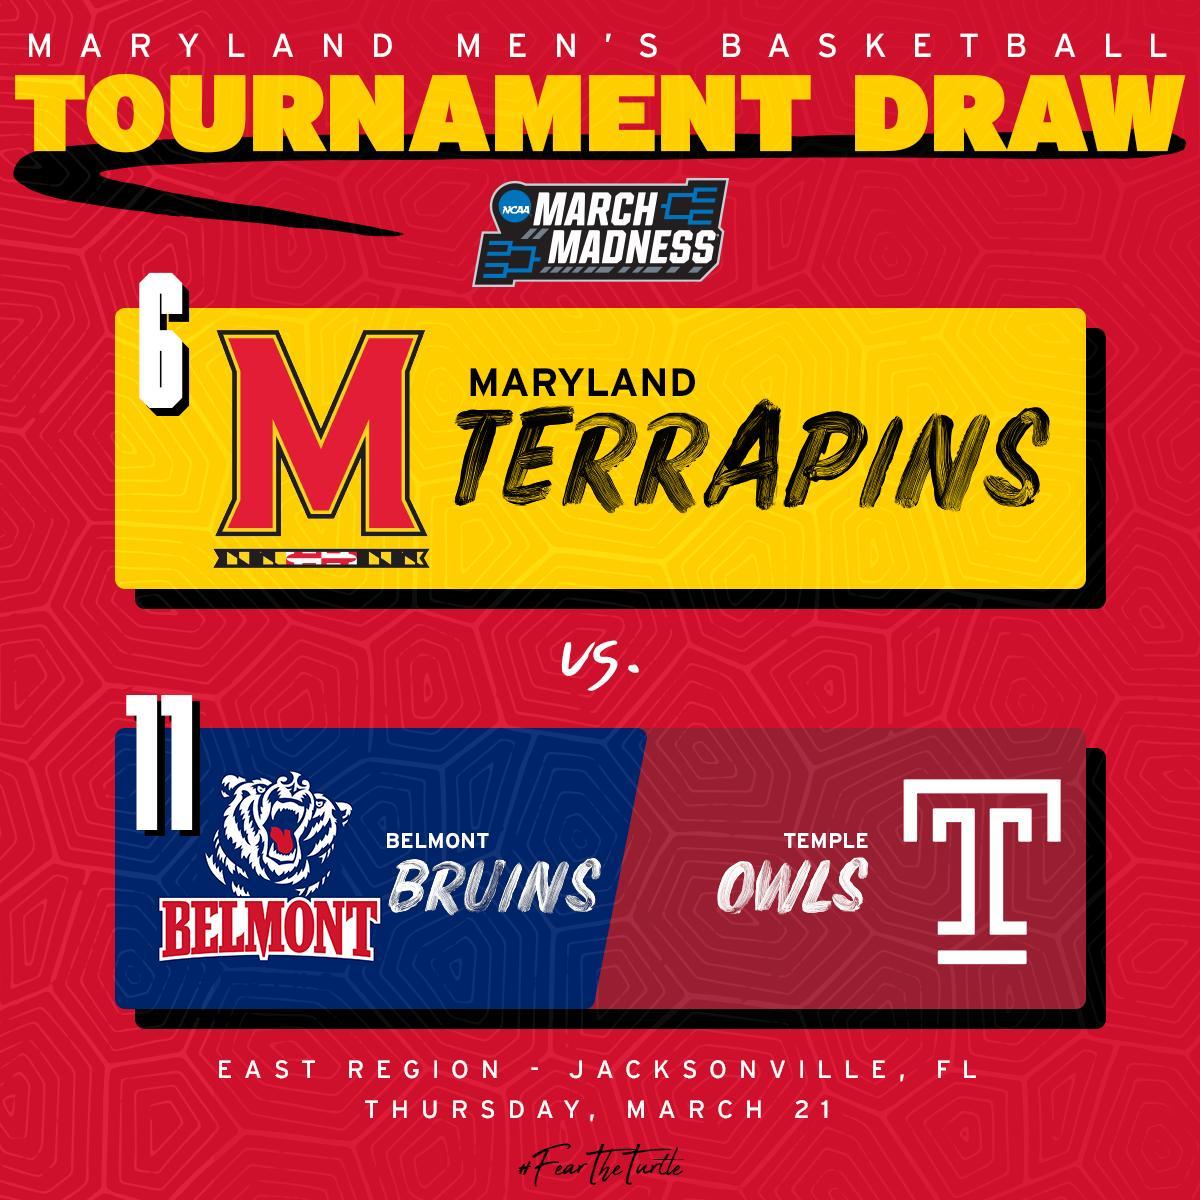 #SelectionSunday   [ 6 #Terps ] - [ 11 Belmont/ 11 Temple ] -   East Region - Jacksonville, Fl Thursday - March 21   #FearTheTurtle<br>http://pic.twitter.com/wXaQMzD0Fw